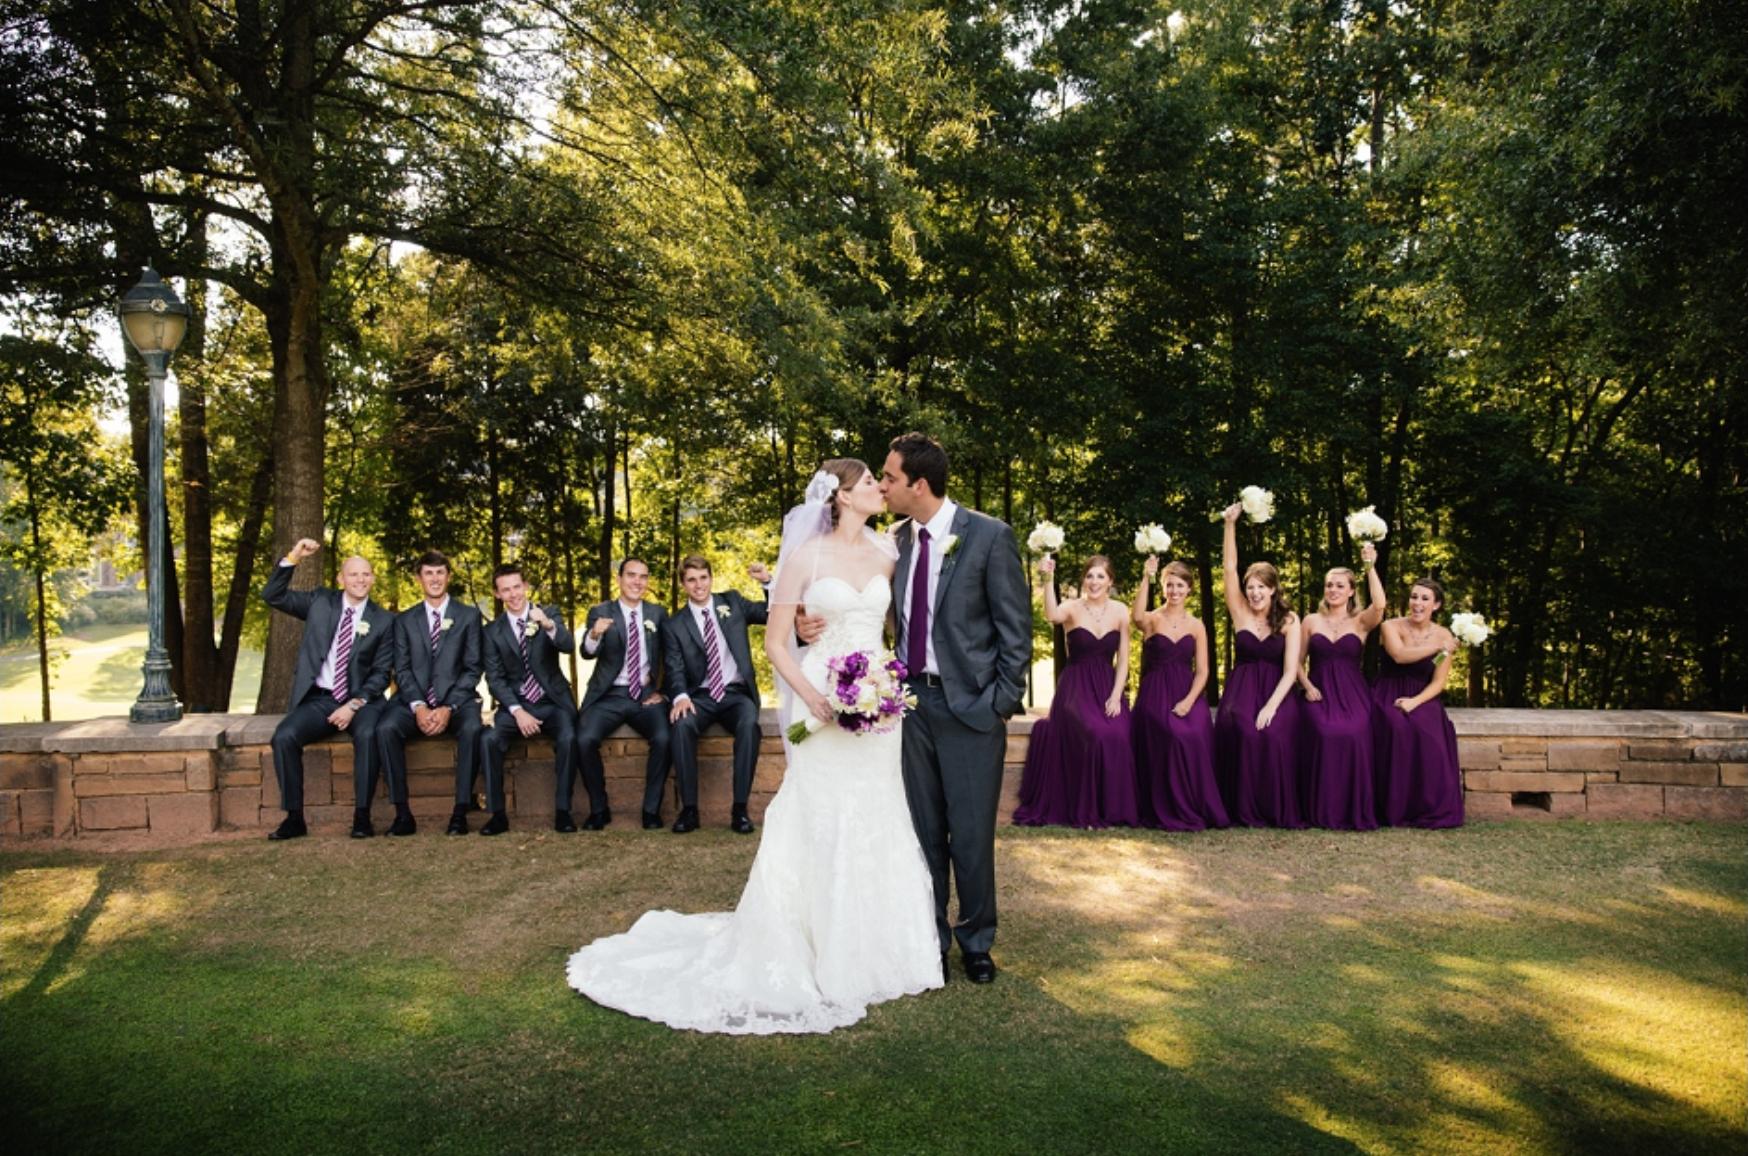 Ballantyne Country Club BLOG POSTREAL WEDDING by Elly @ Ballantyne Country Club -